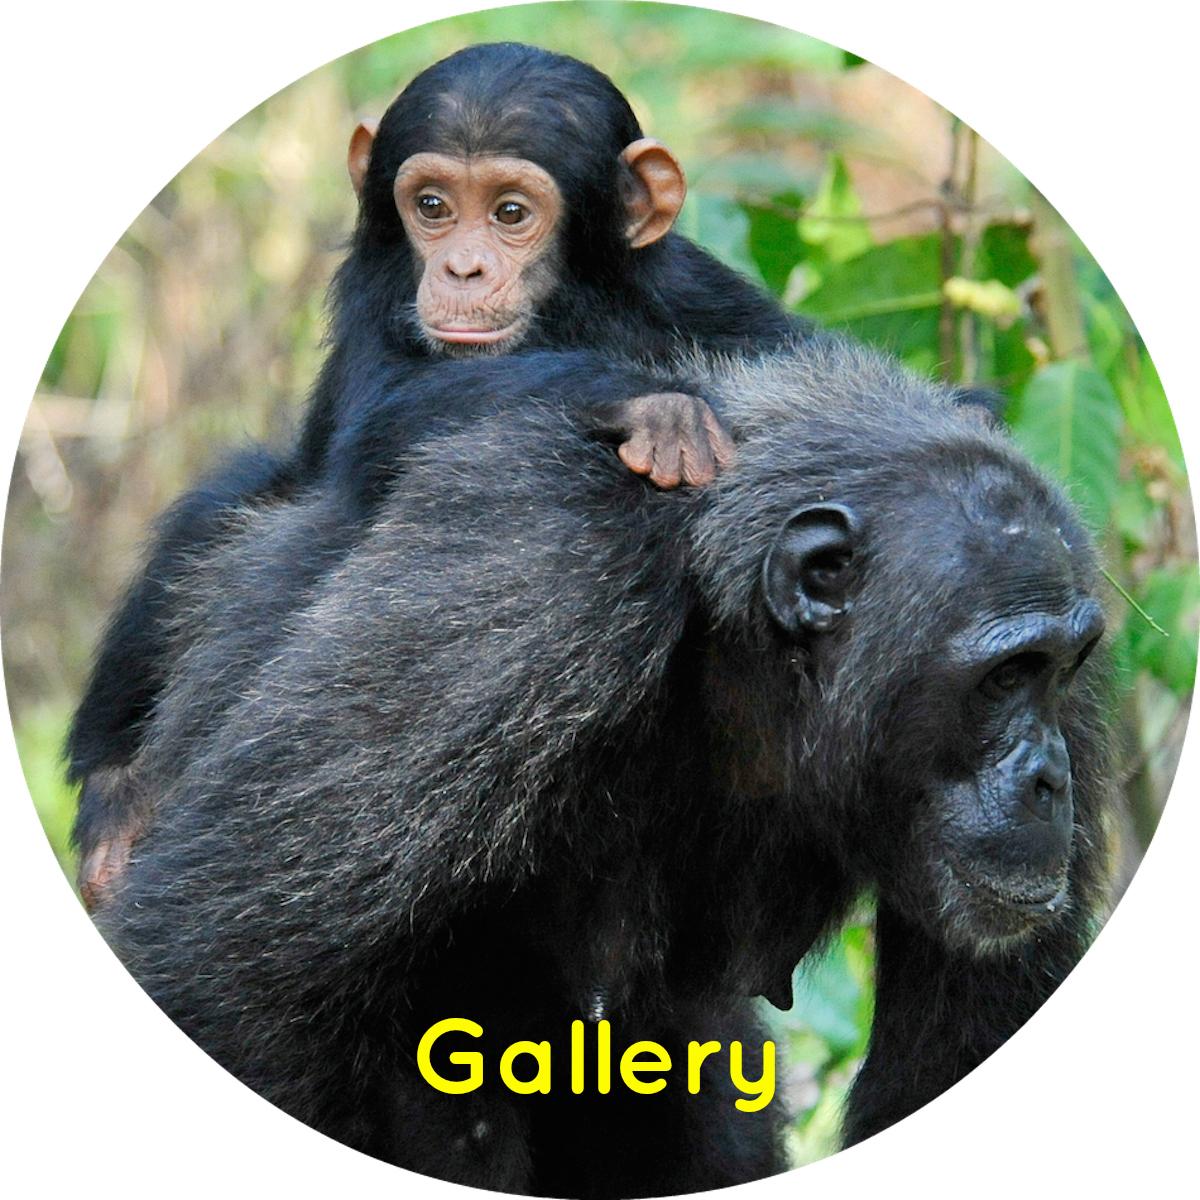 Chimpanzee gallery thumb.jpg